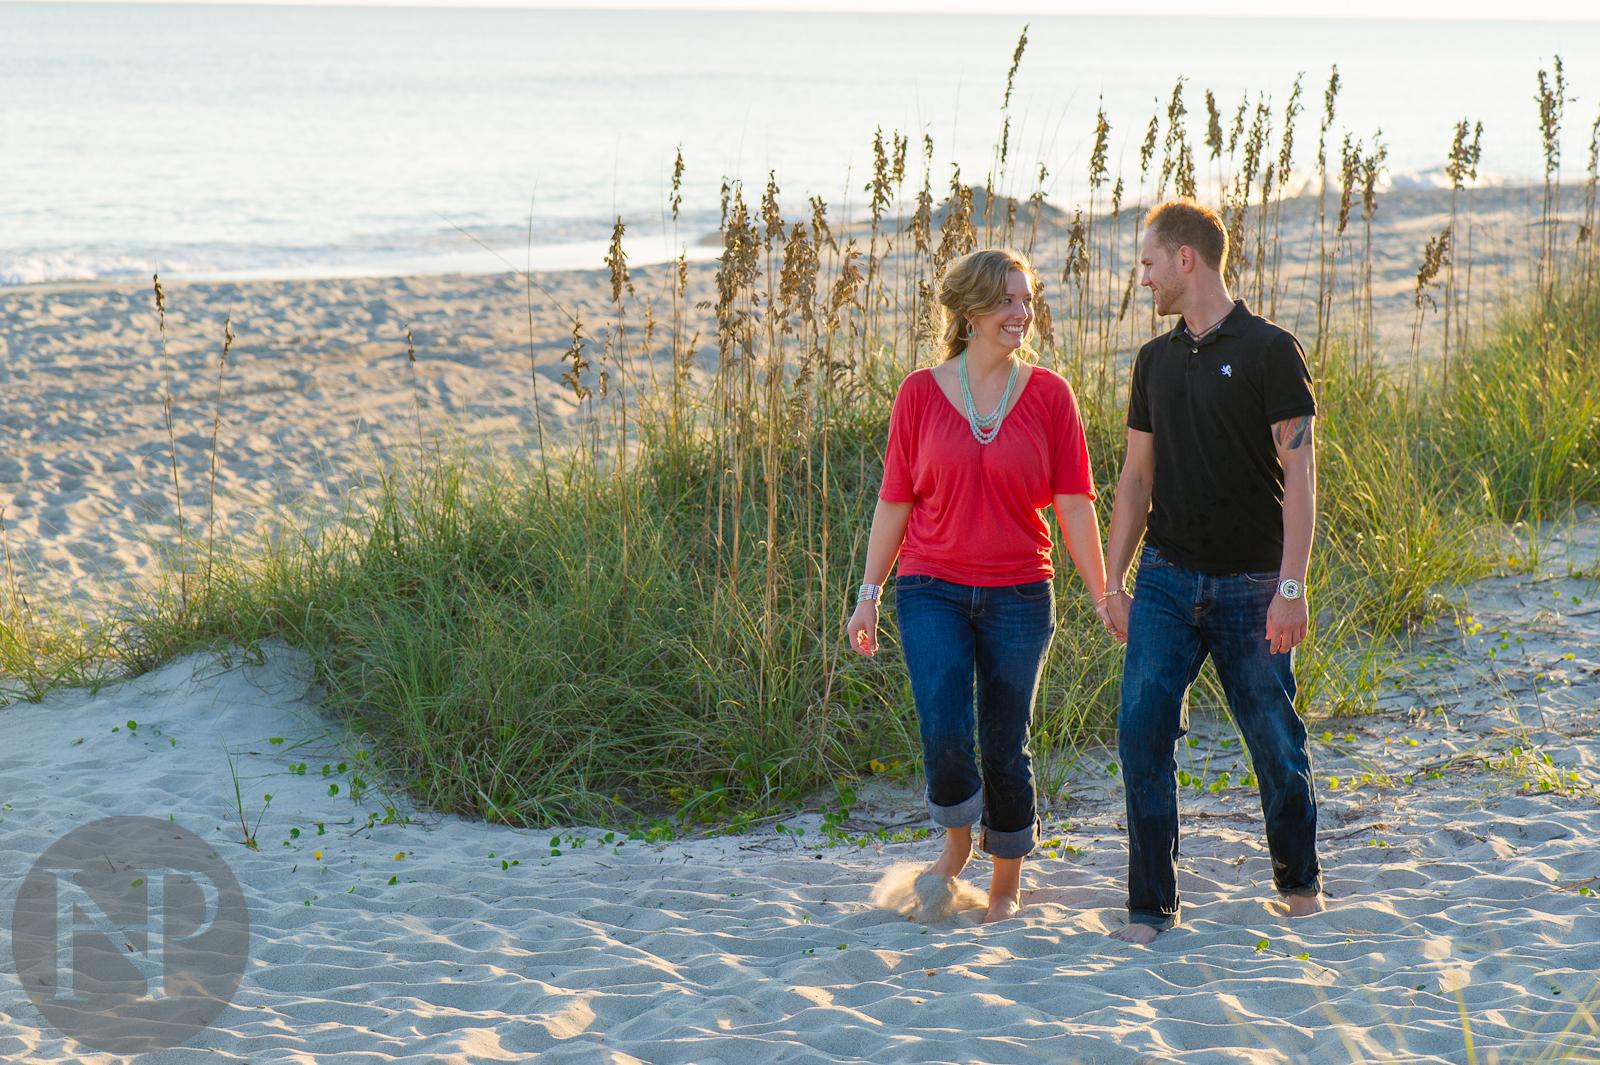 wedding photography north carolina - dc photographer - altantic ocean - beach photography engagement photo denis kaleigh-6.jpg